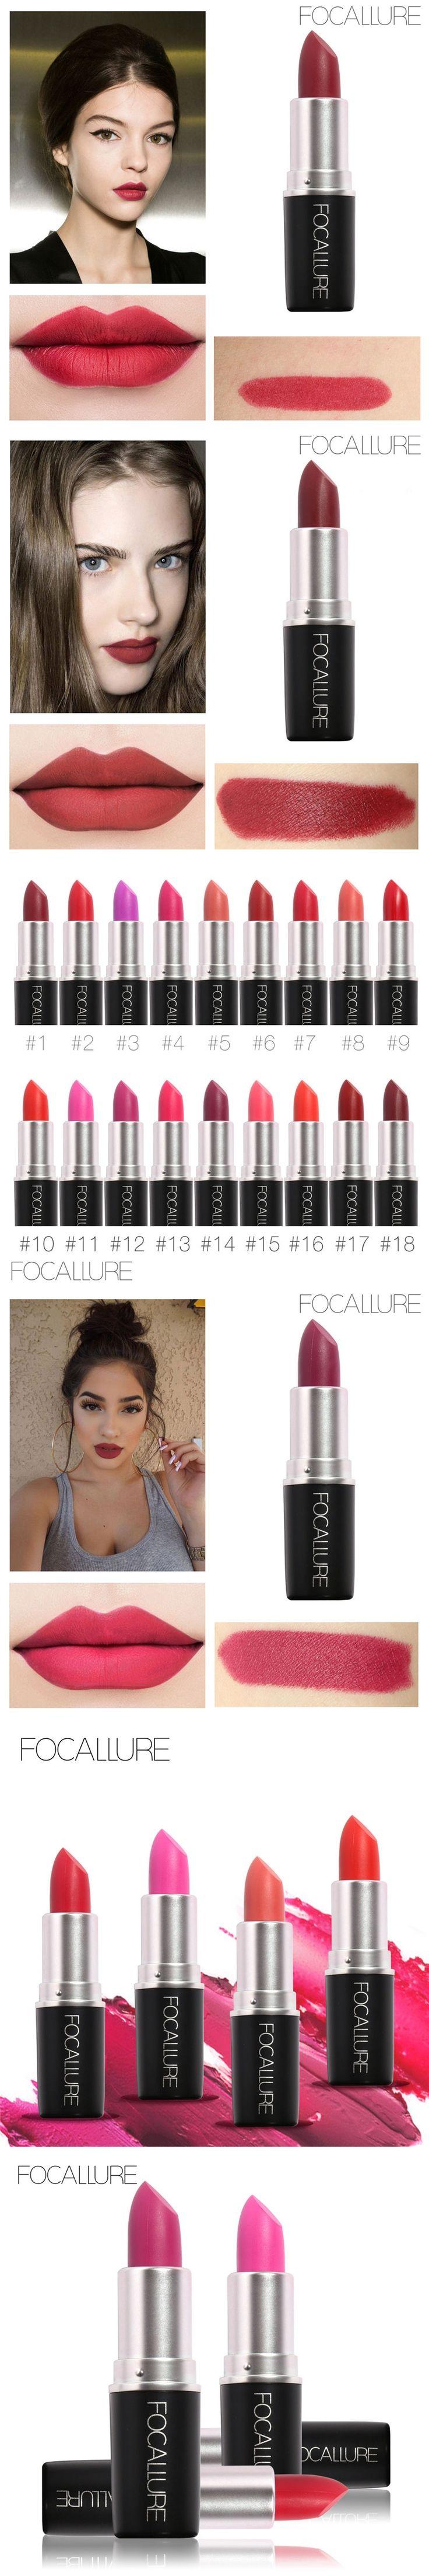 FOCALLURE 18 Colors Matte Lipstick Long Lasting Korean Lips Makeup Waterproof Lip stick Nude Lip Cosmetics  Lipgloss Brand